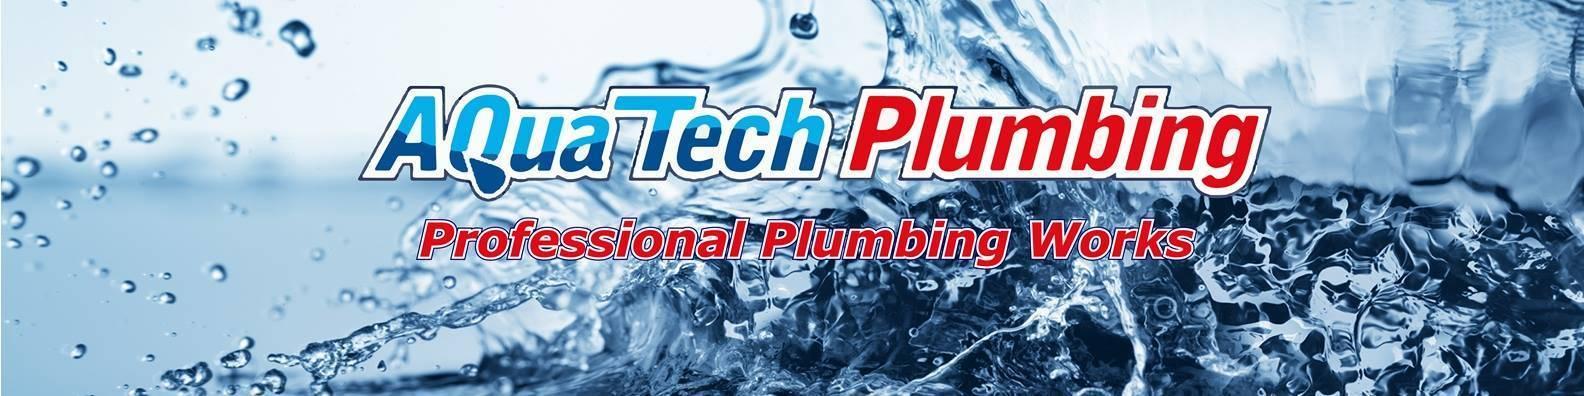 aquatech plumbing banner